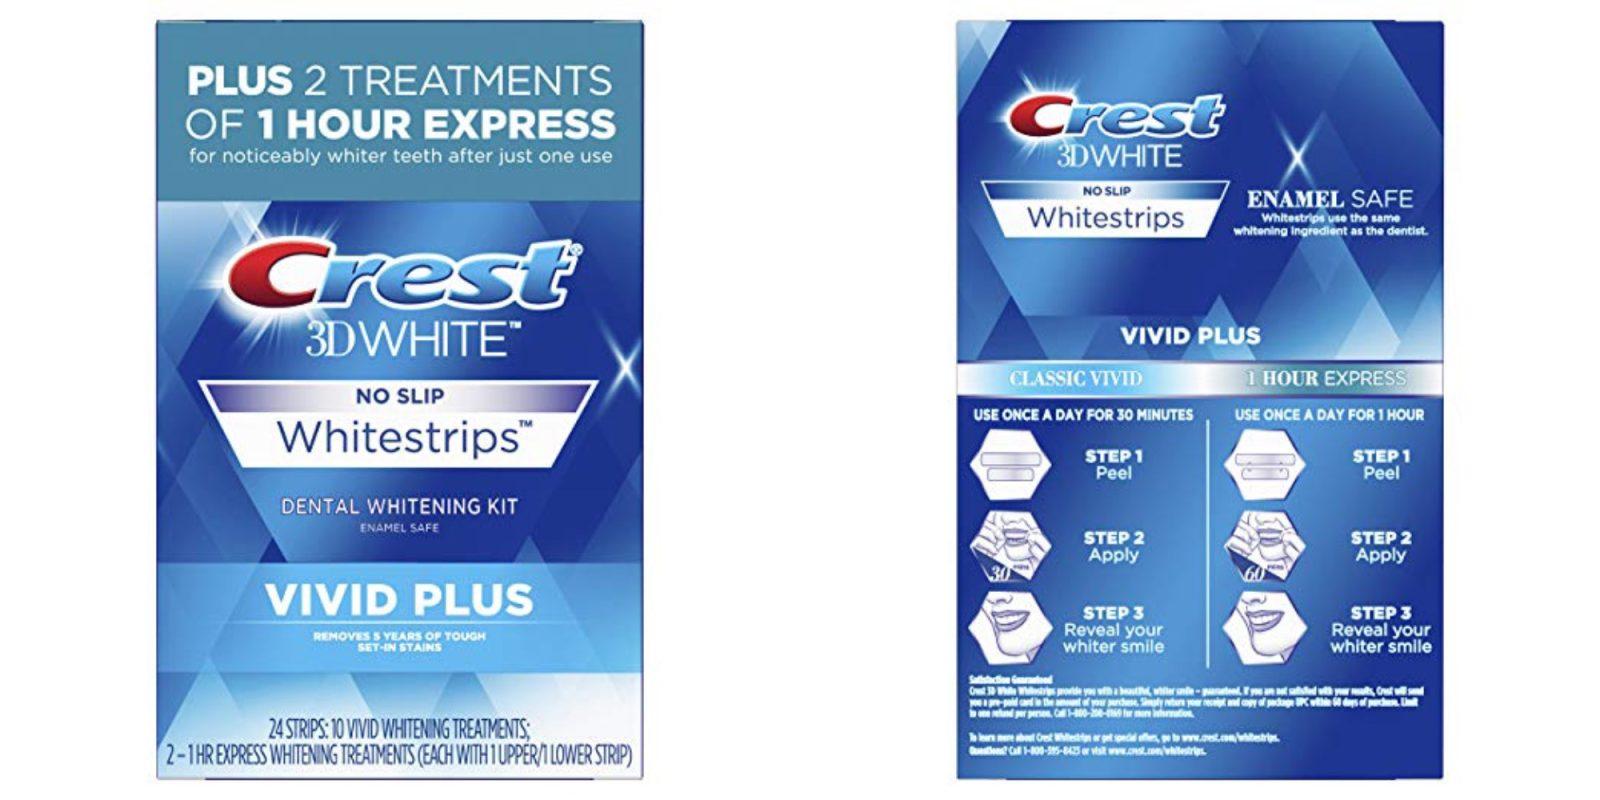 Amazon Has 10 Treatments Of Crest S 3d Vivid Plus Whitestrips For